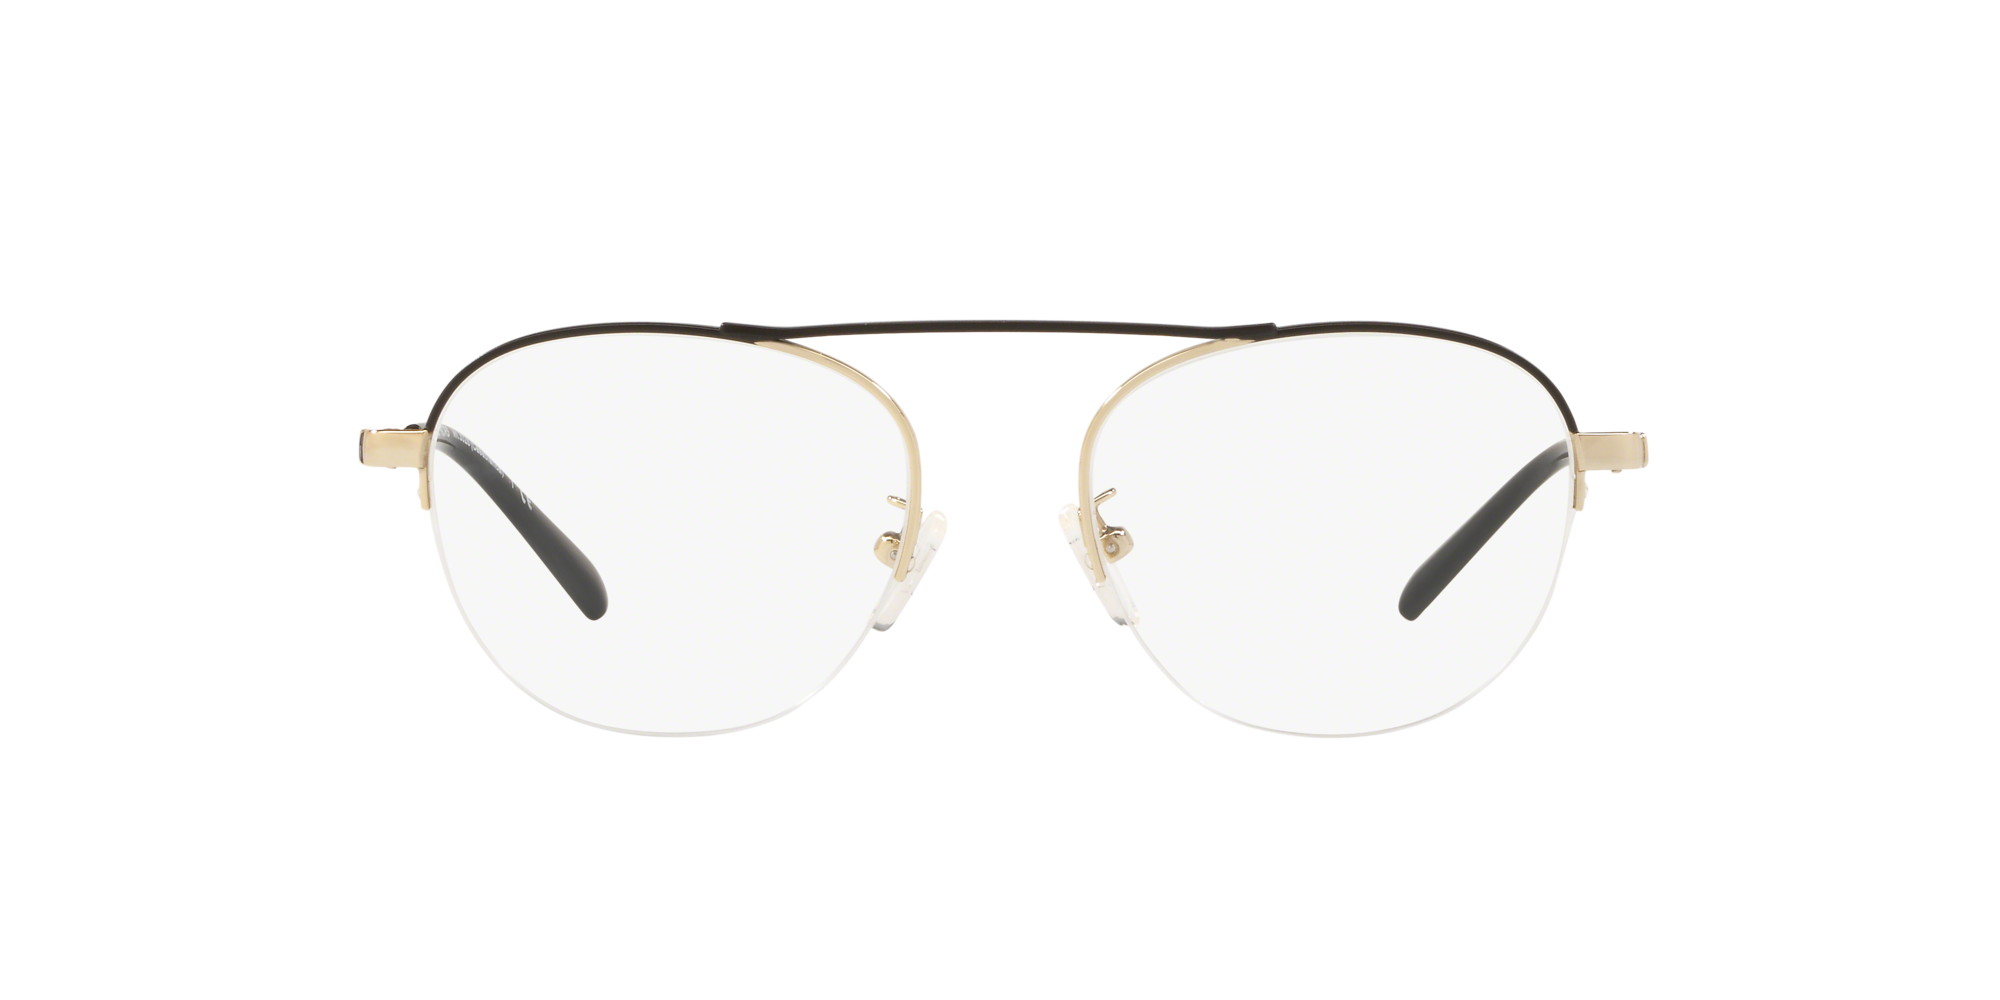 Image for MK3028 CASABLANCA from LensCrafters | Glasses, Prescription Glasses Online, Eyewear